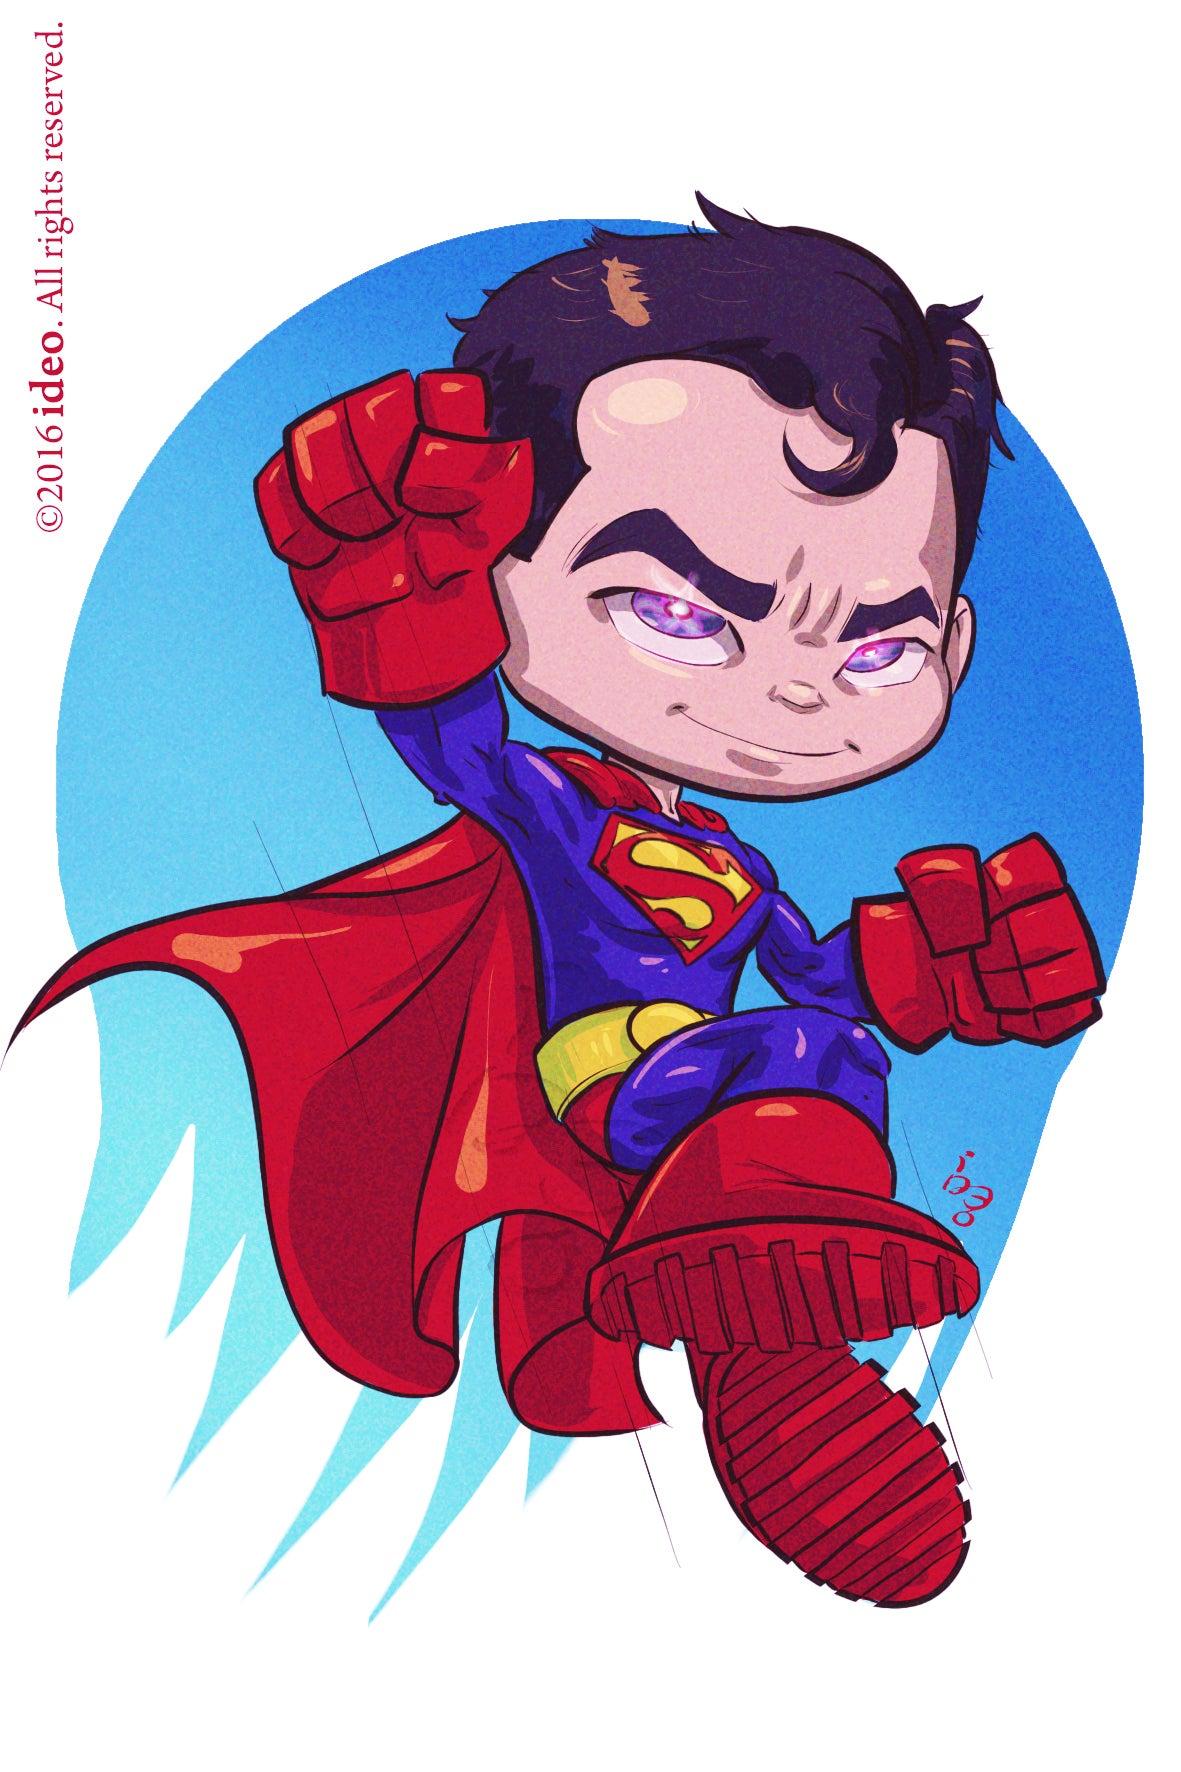 Image of Chibi Superman Print